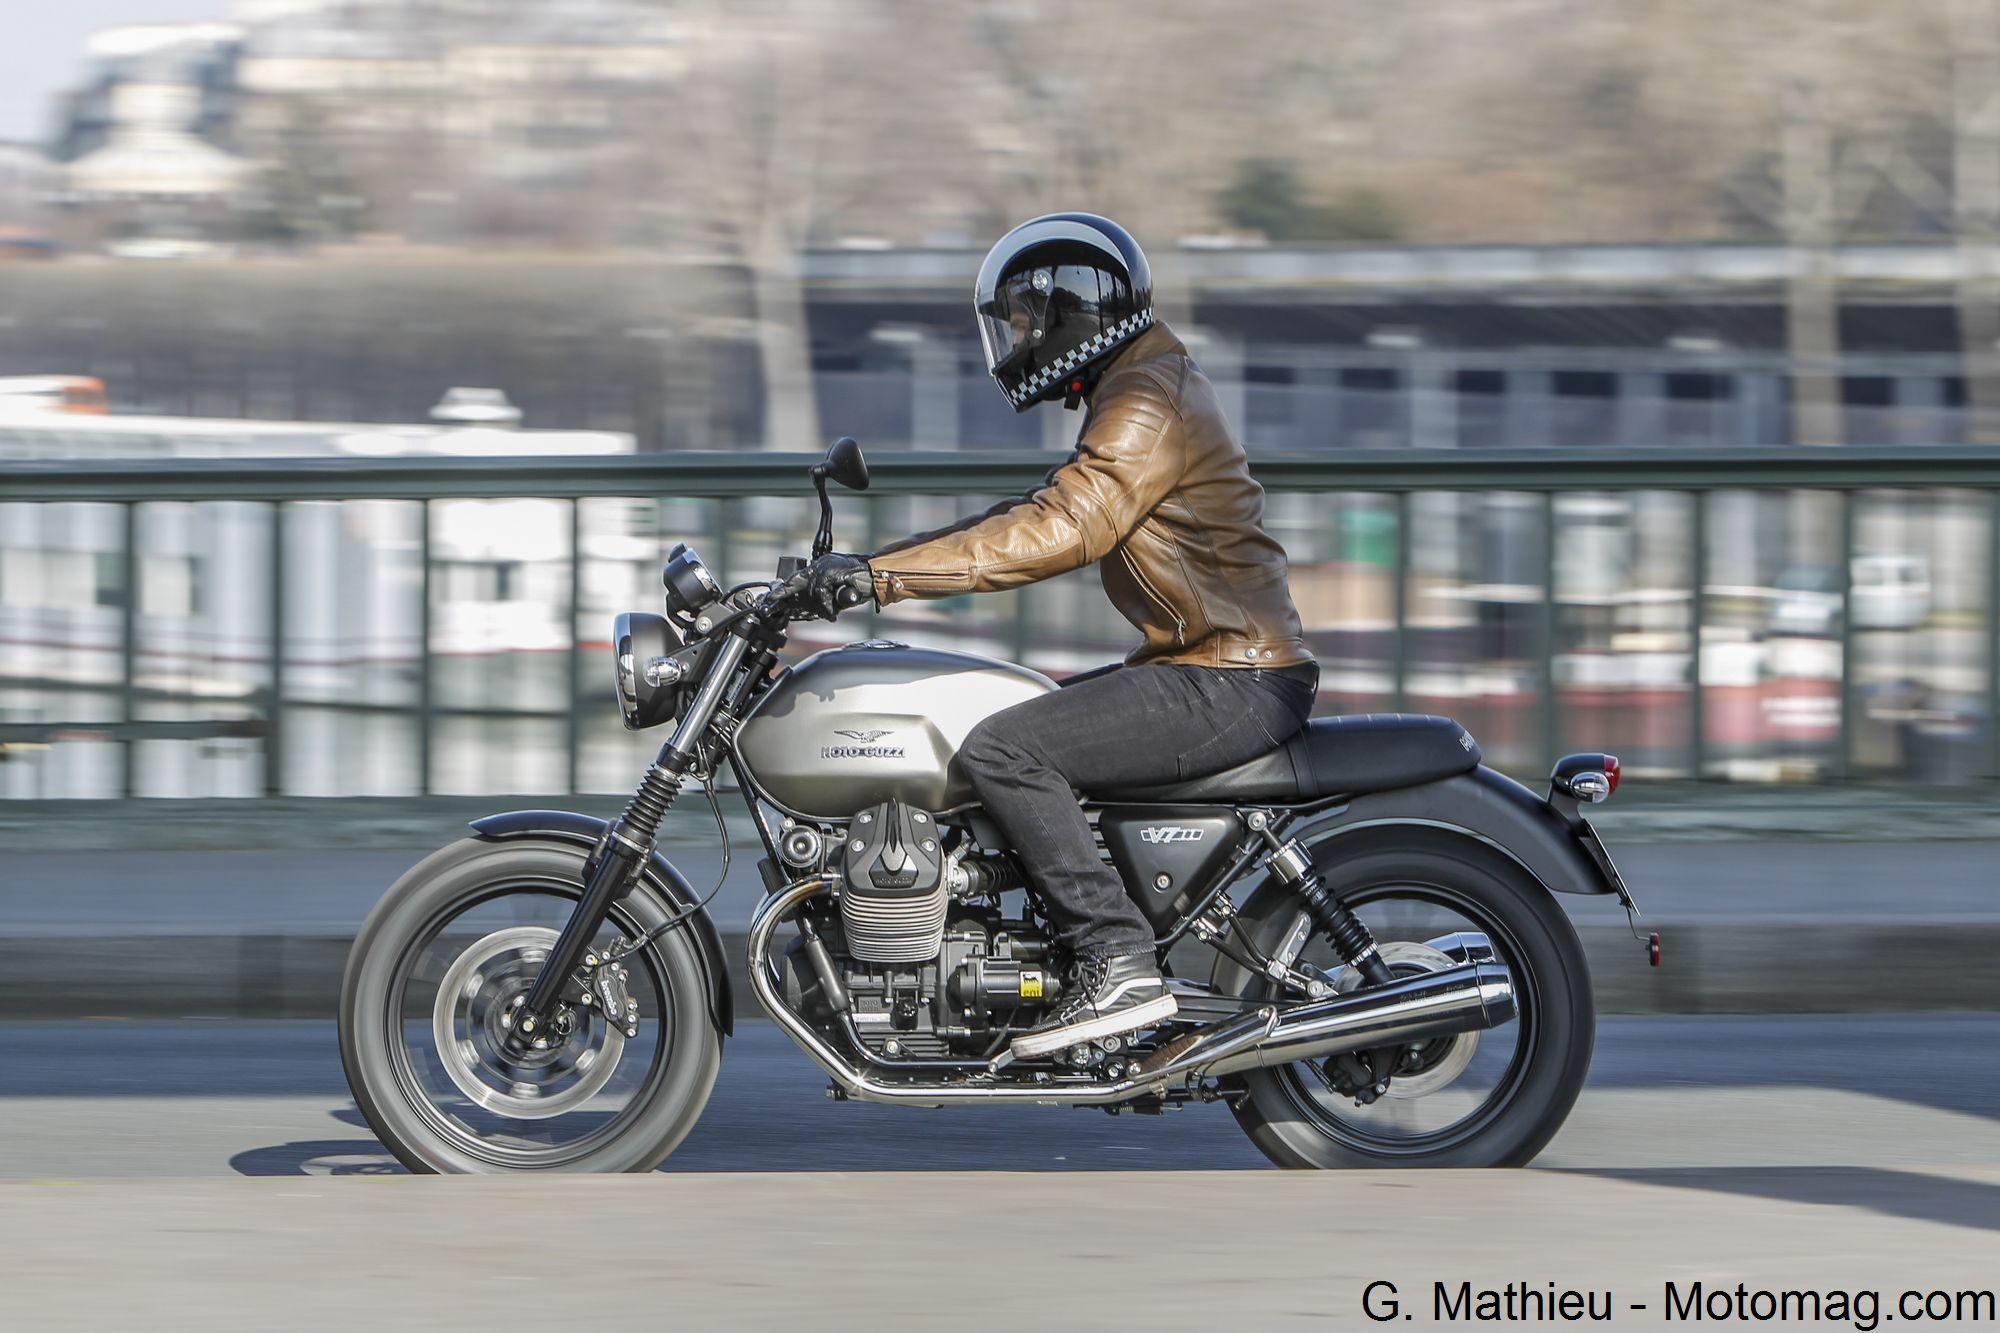 Forum motomag - Sujet : Essai Moto Guzzi V7 II Stone